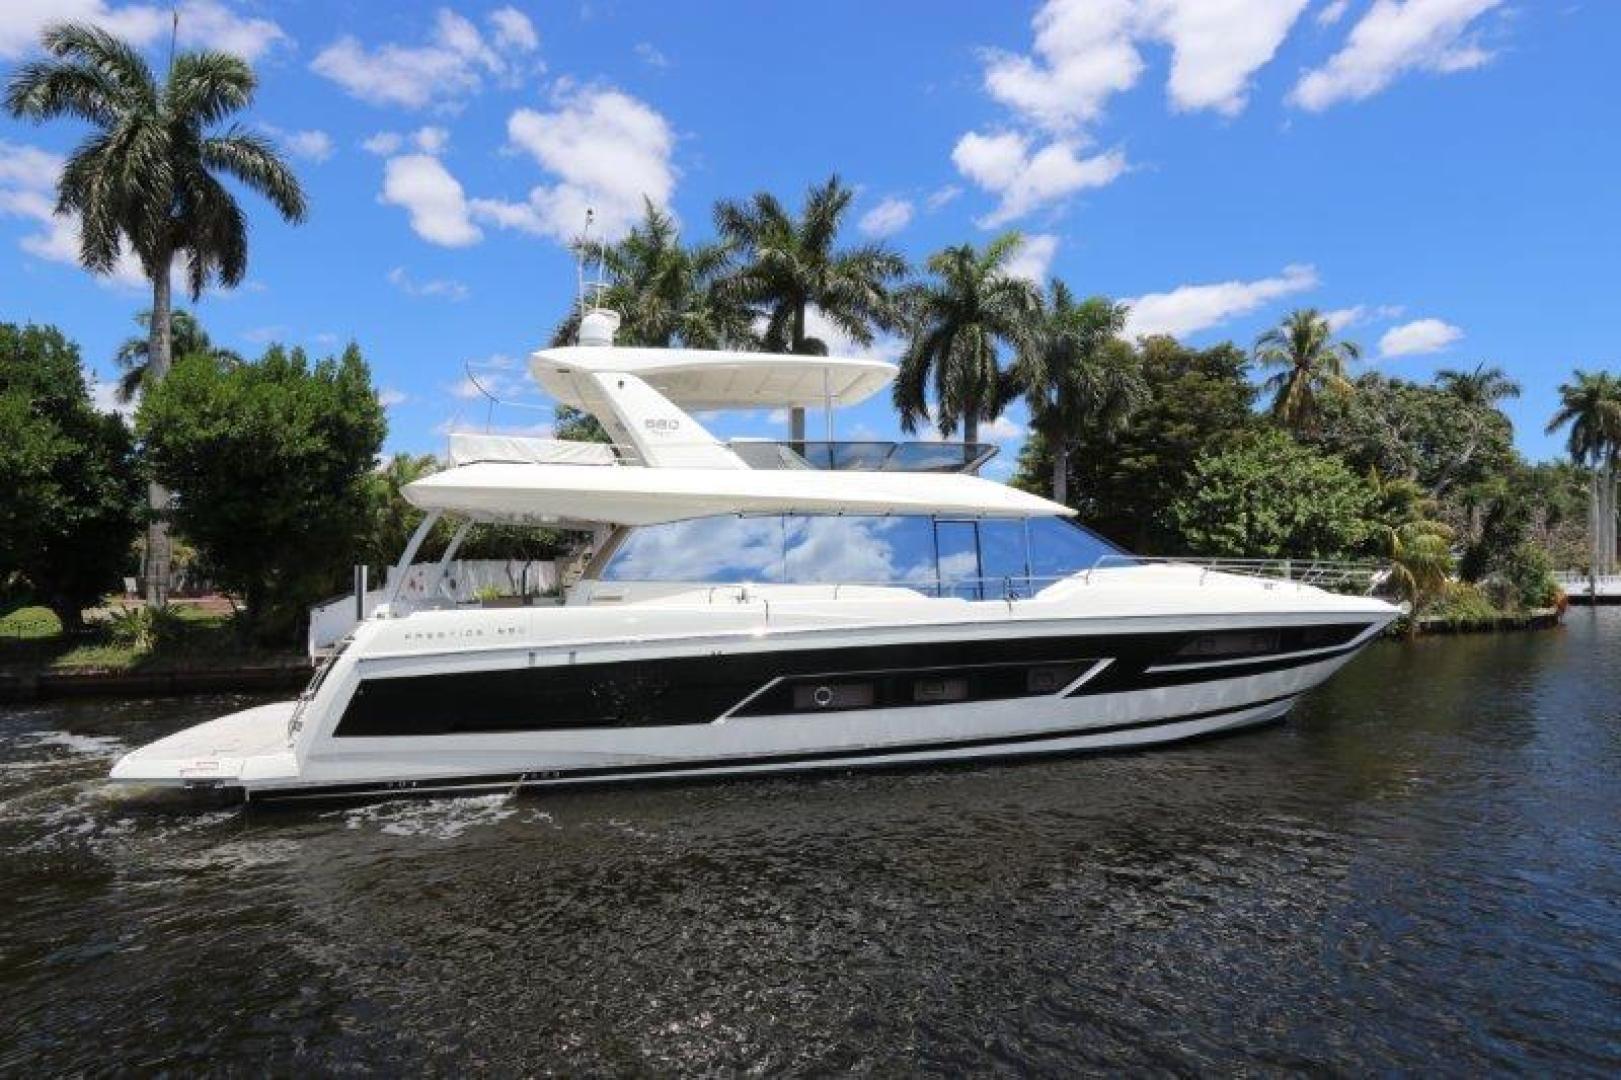 Prestige-Motoryacht 2017-Breathe Easy Fort Lauderdale-Florida-United States-1303844   Thumbnail